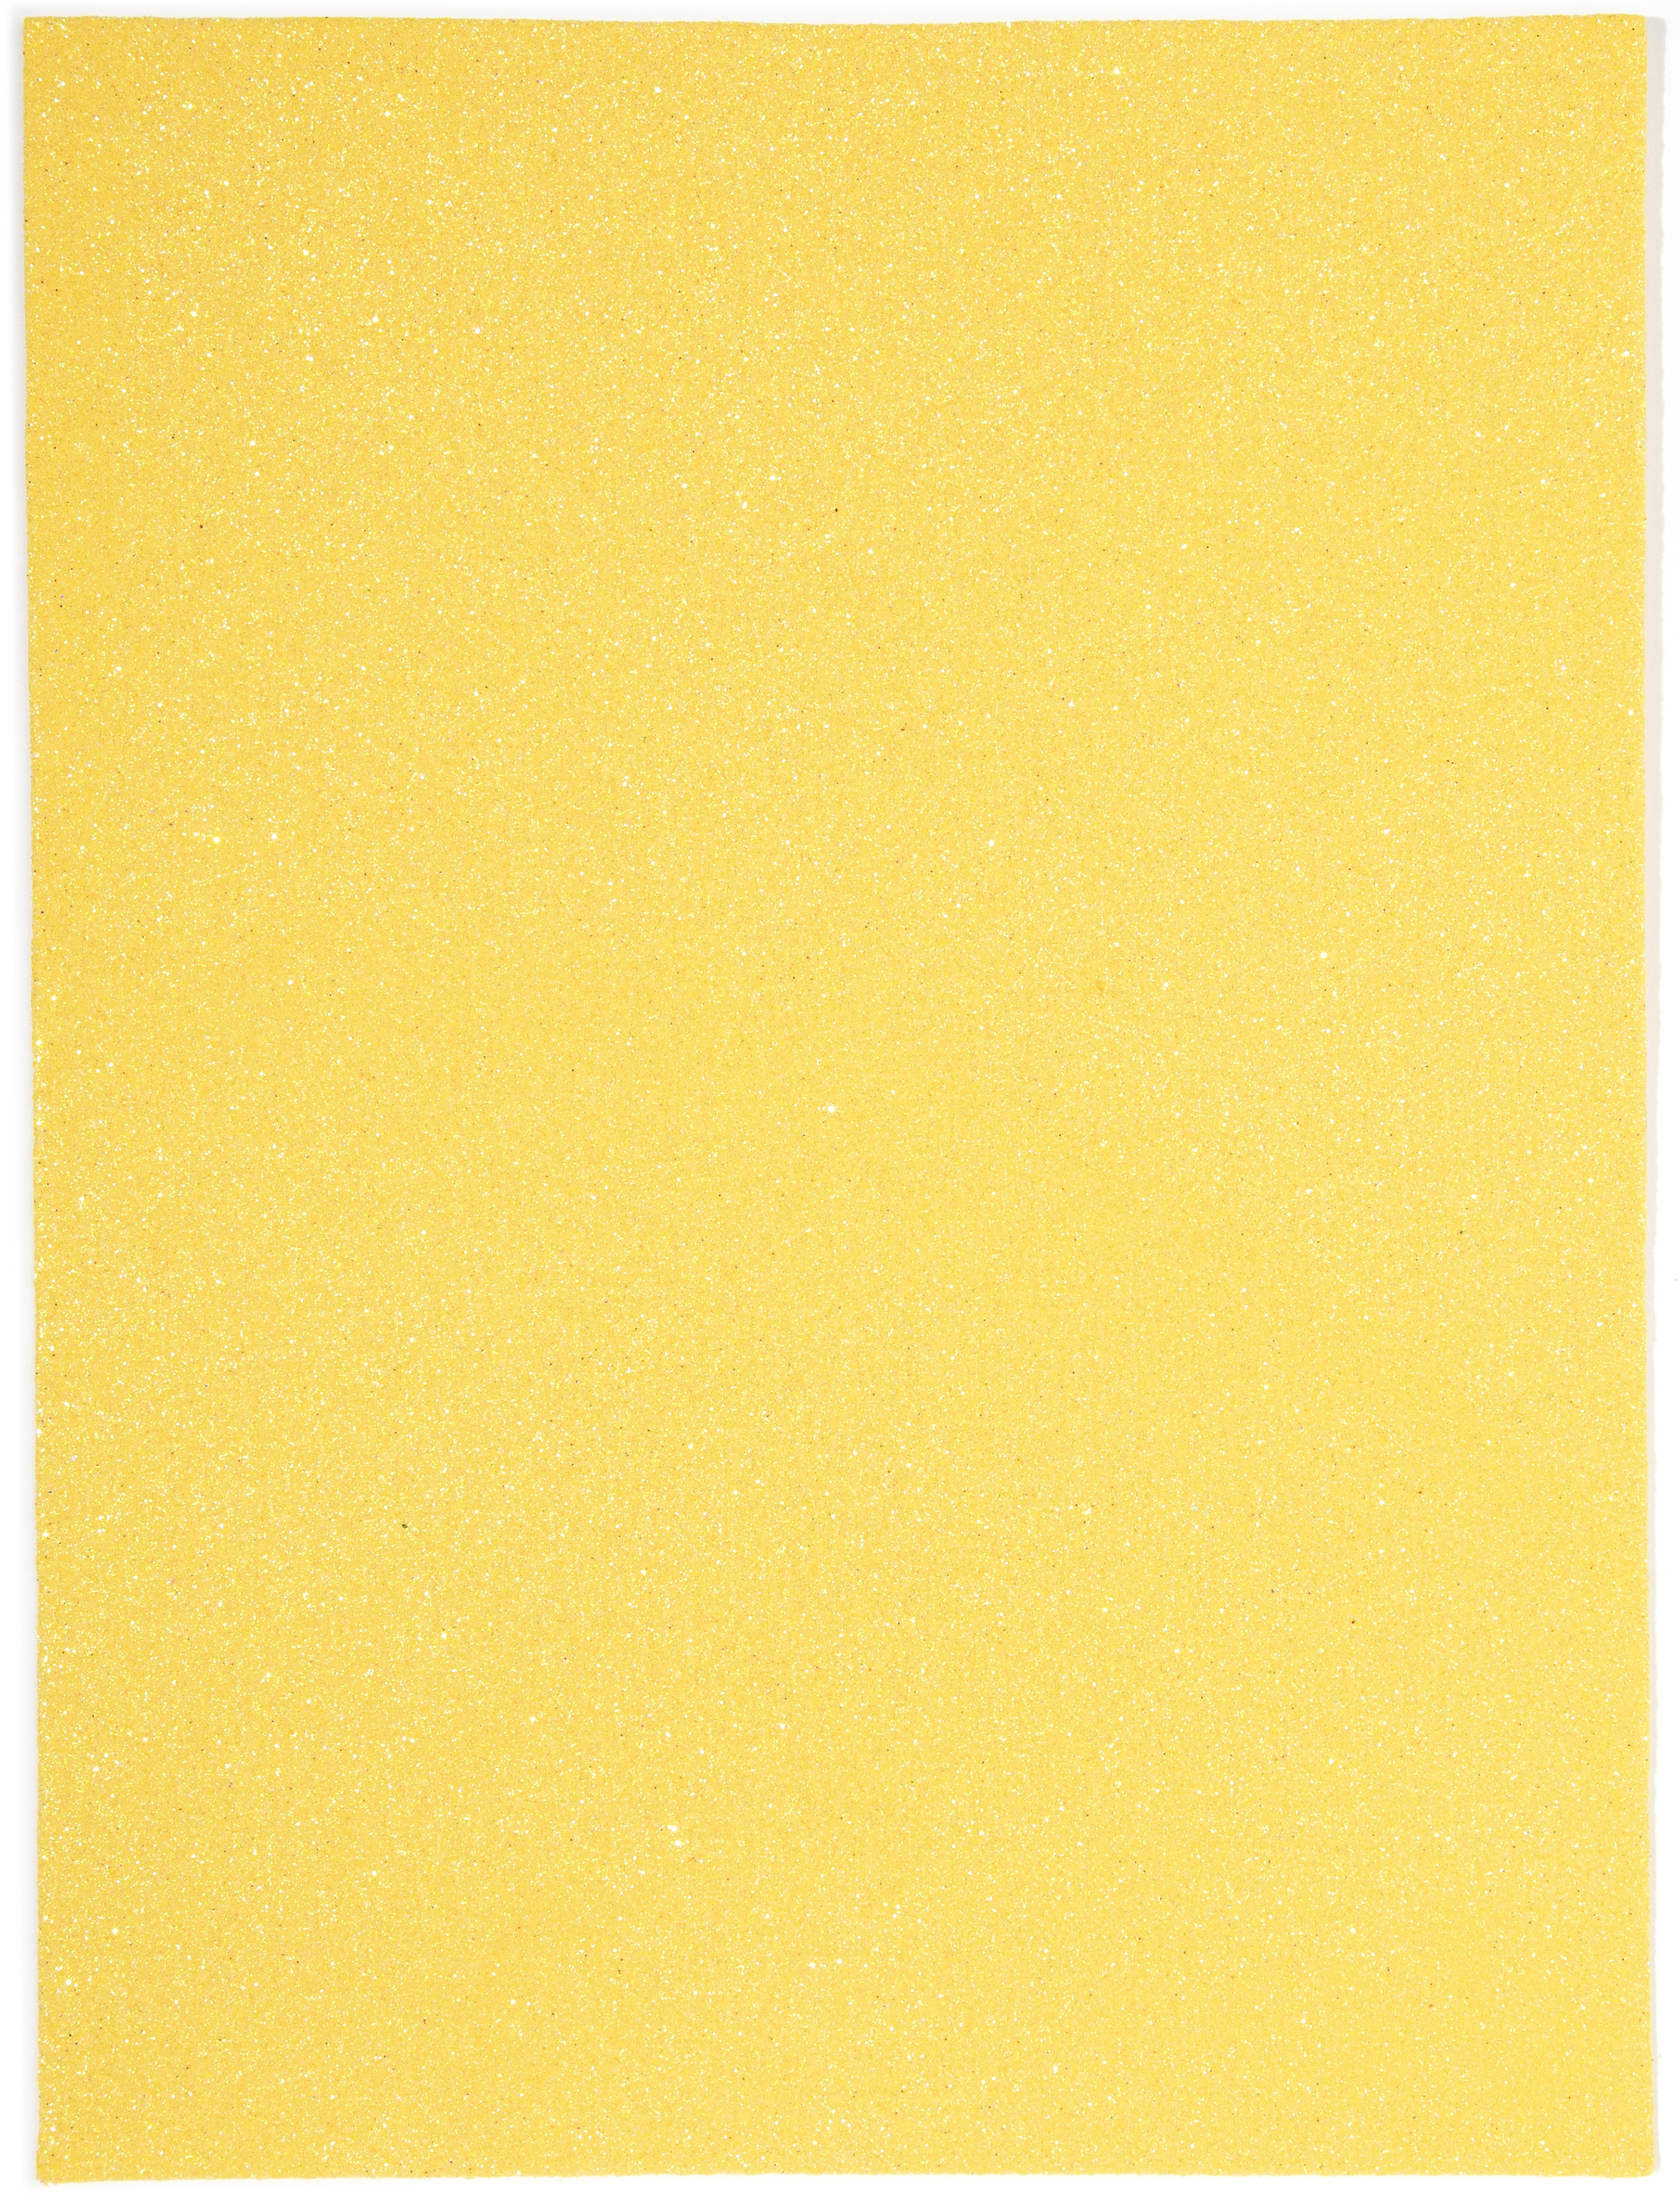 Glitter Foam Sheet 9X12 2mm-Gold